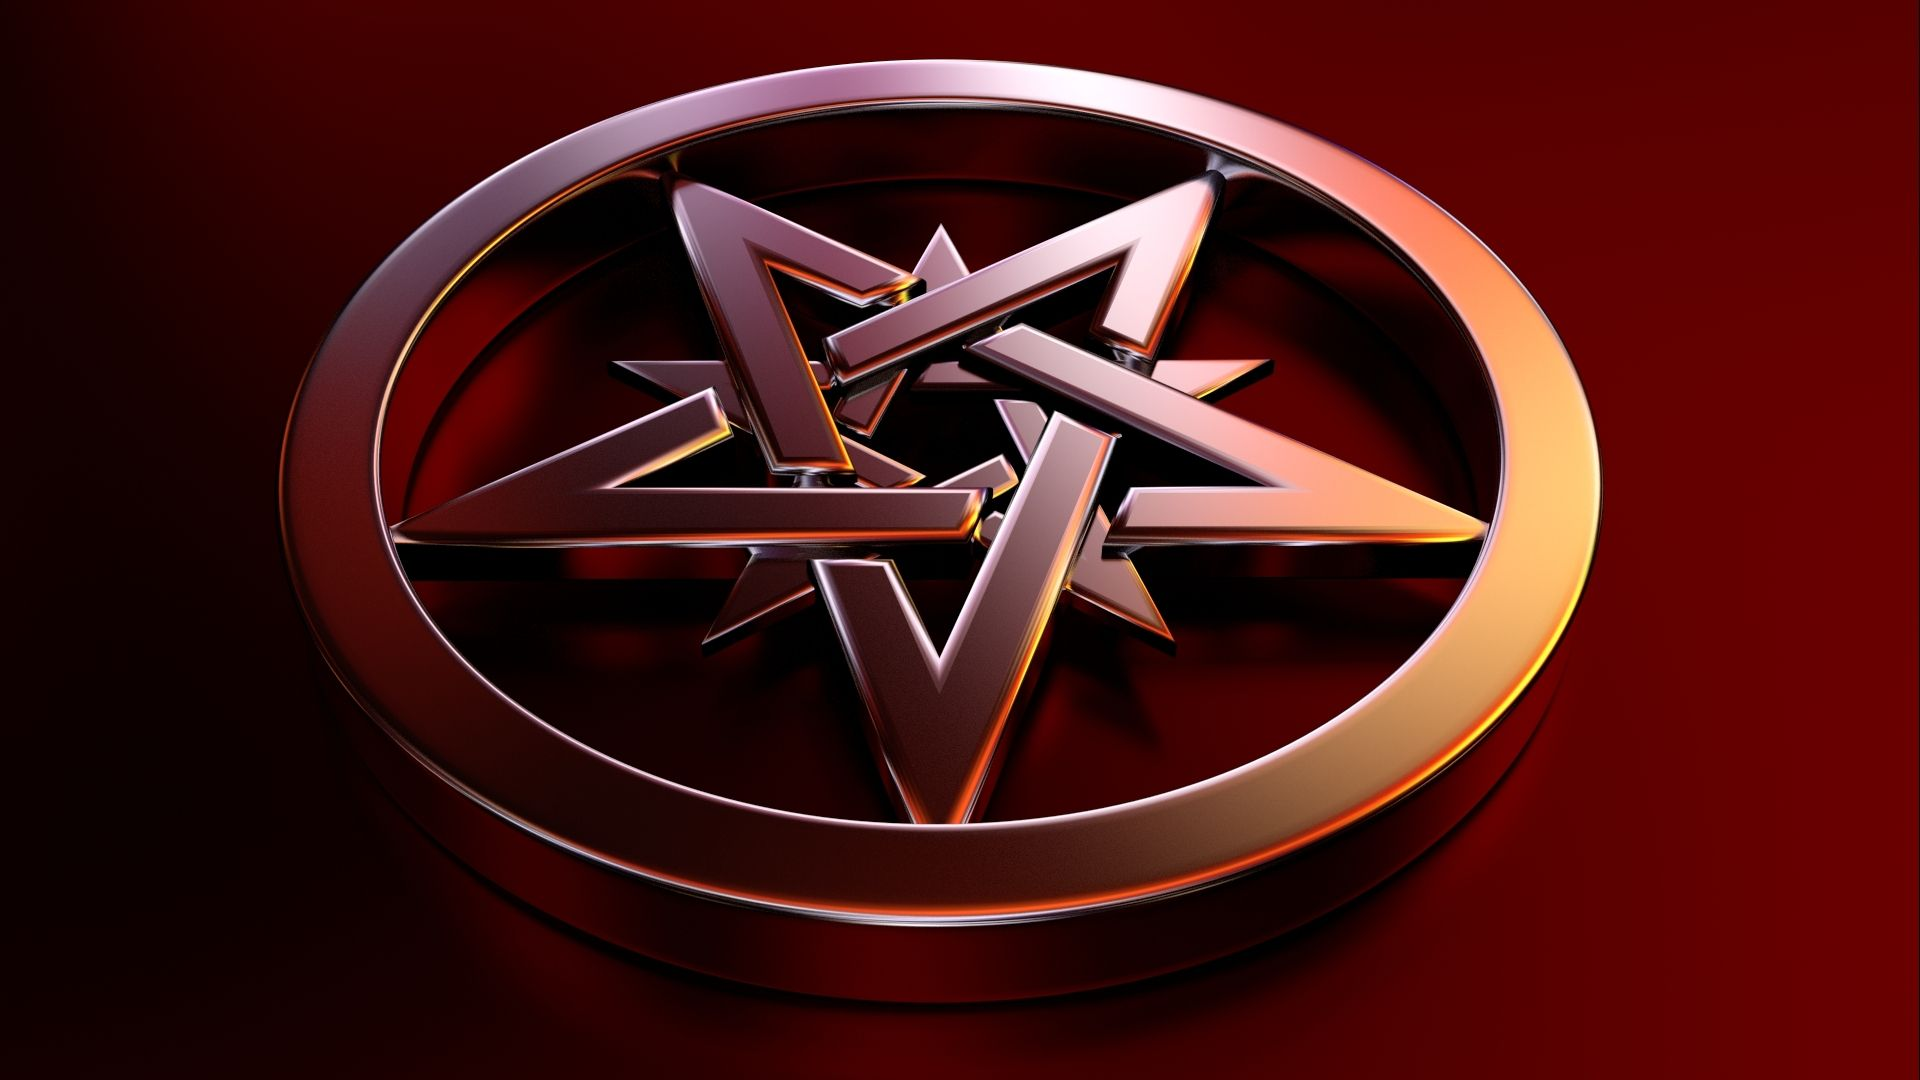 Pentagram free download wallpaper